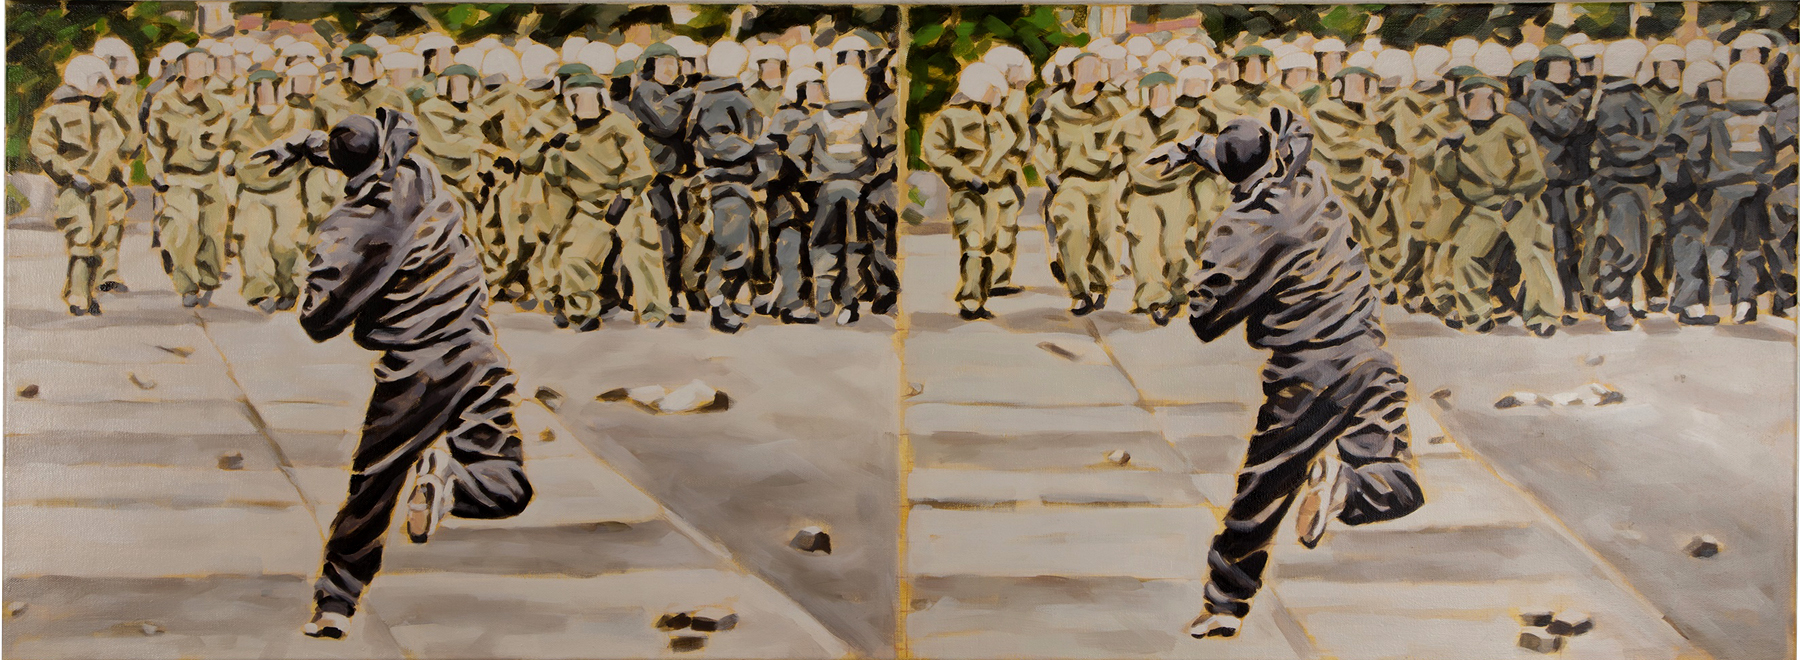 """Eskalation II, Rostock 2007"", Öl auf Leinwand, 60 x 160 cm, 2016"